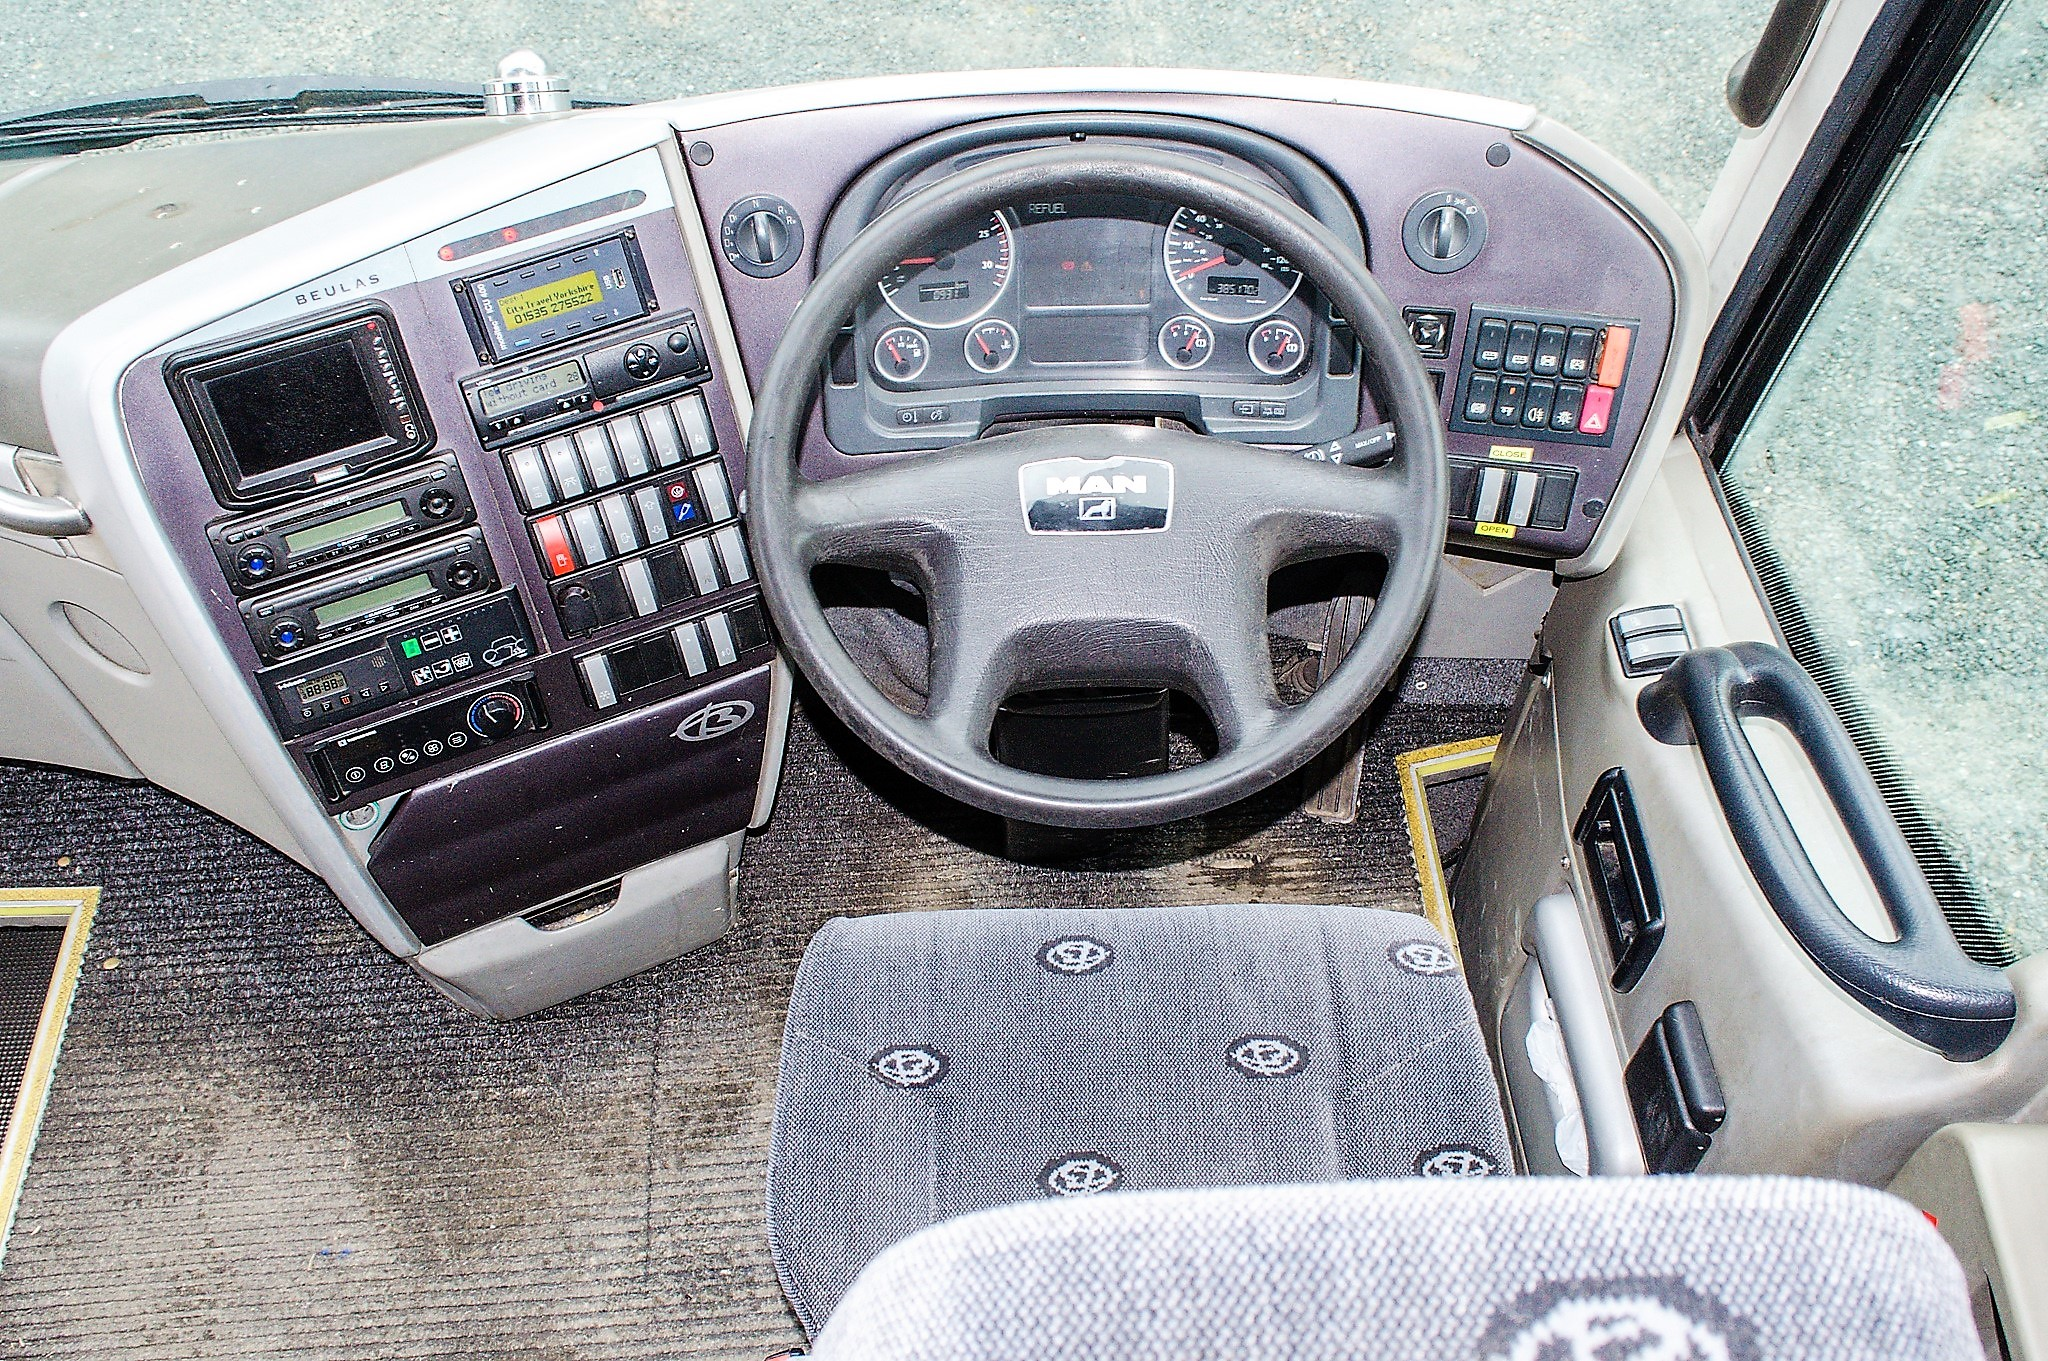 MAN F2000 Beulas Aura 54 seat luxury coach Registration Number: KC08 KTC Date of Registration: 30/ - Image 17 of 19